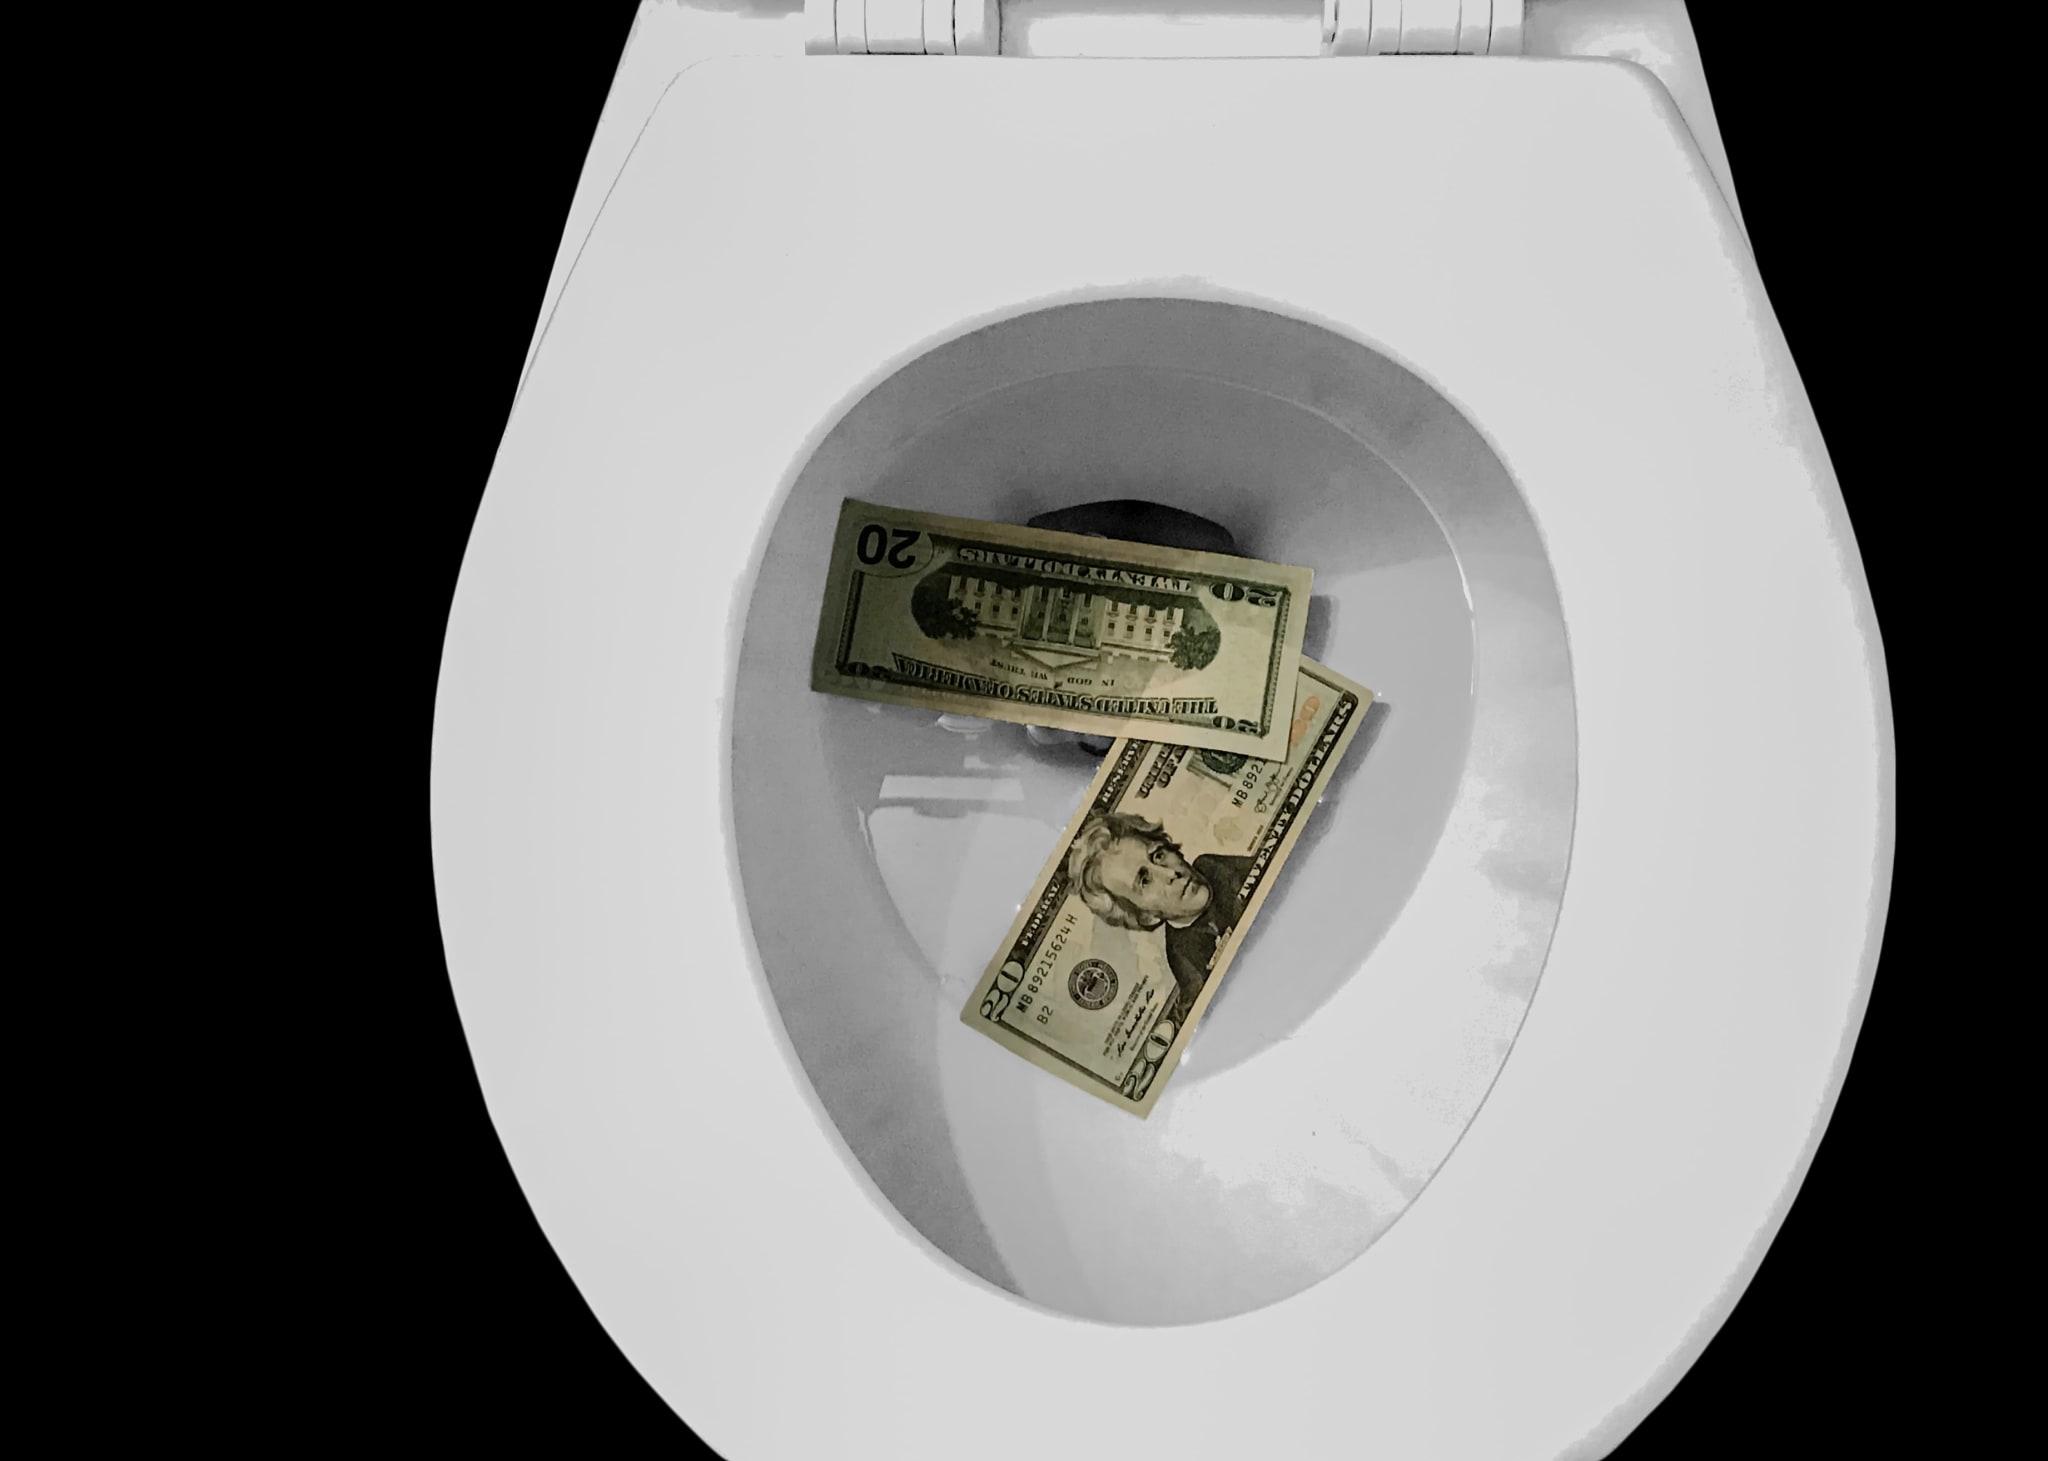 Filling vacancy money